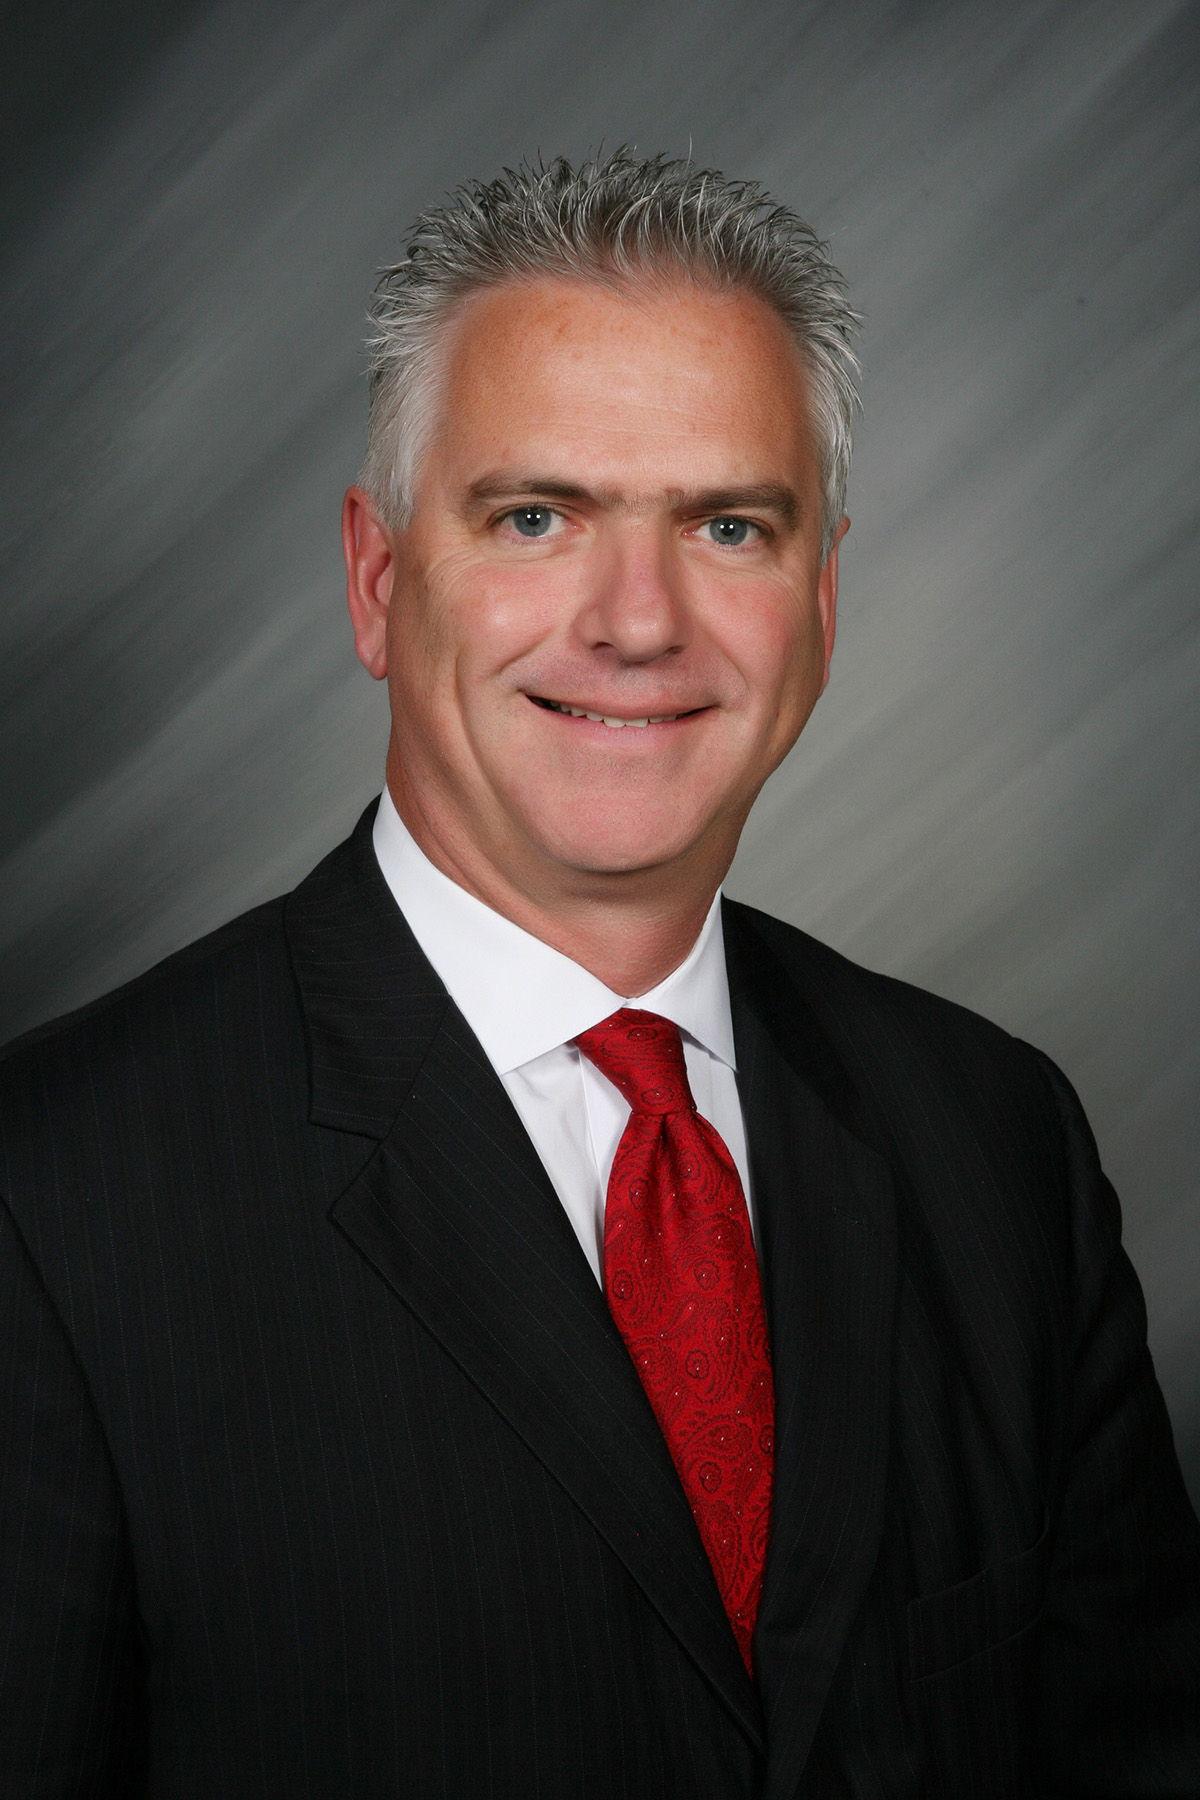 Eric Bassler